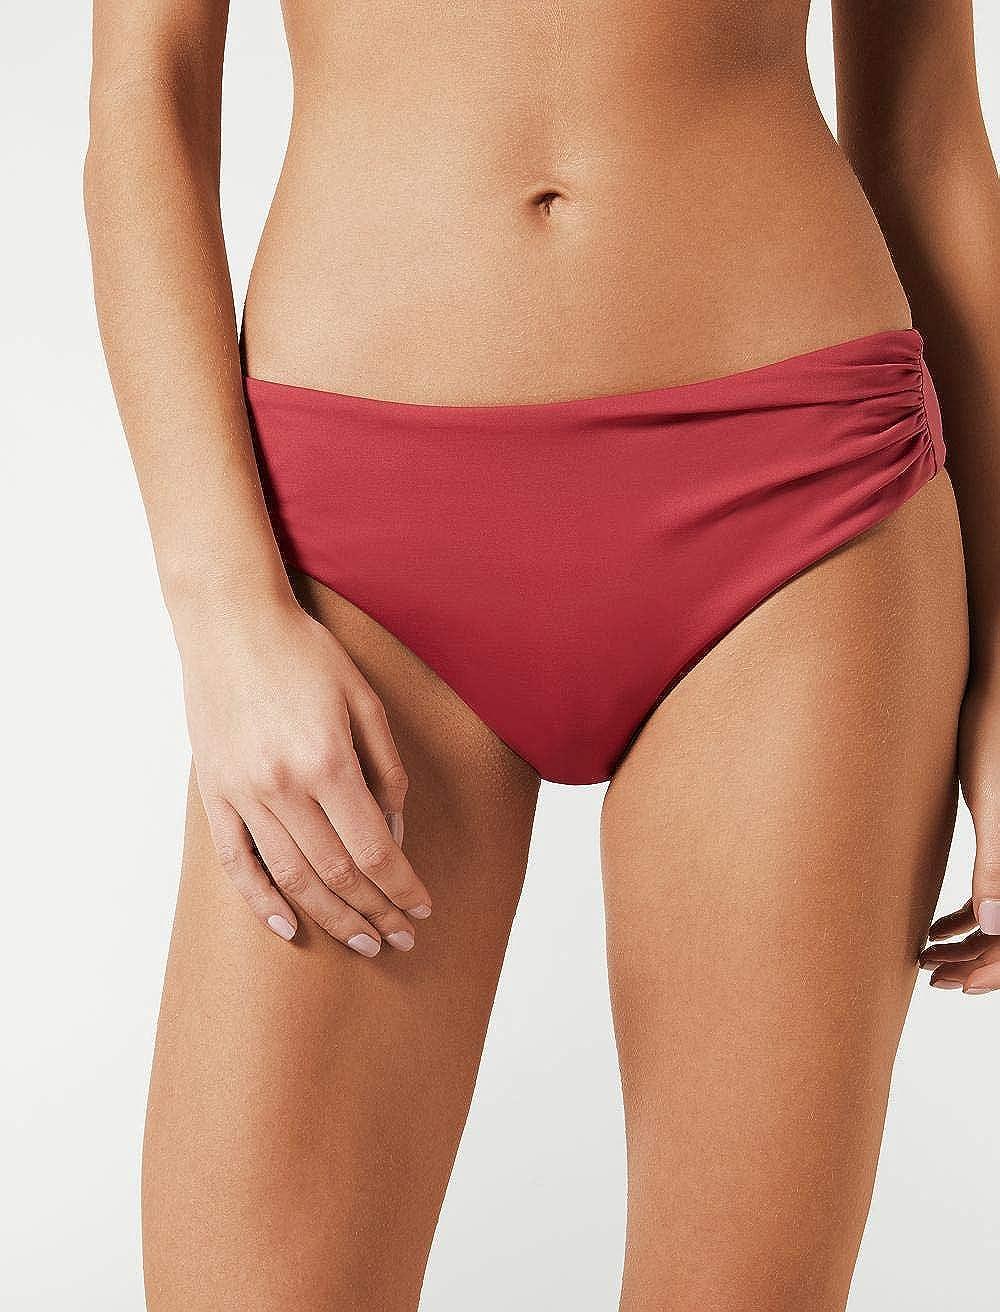 Calzedonia Womens Indonesia High-Waisted Bikini Bottoms